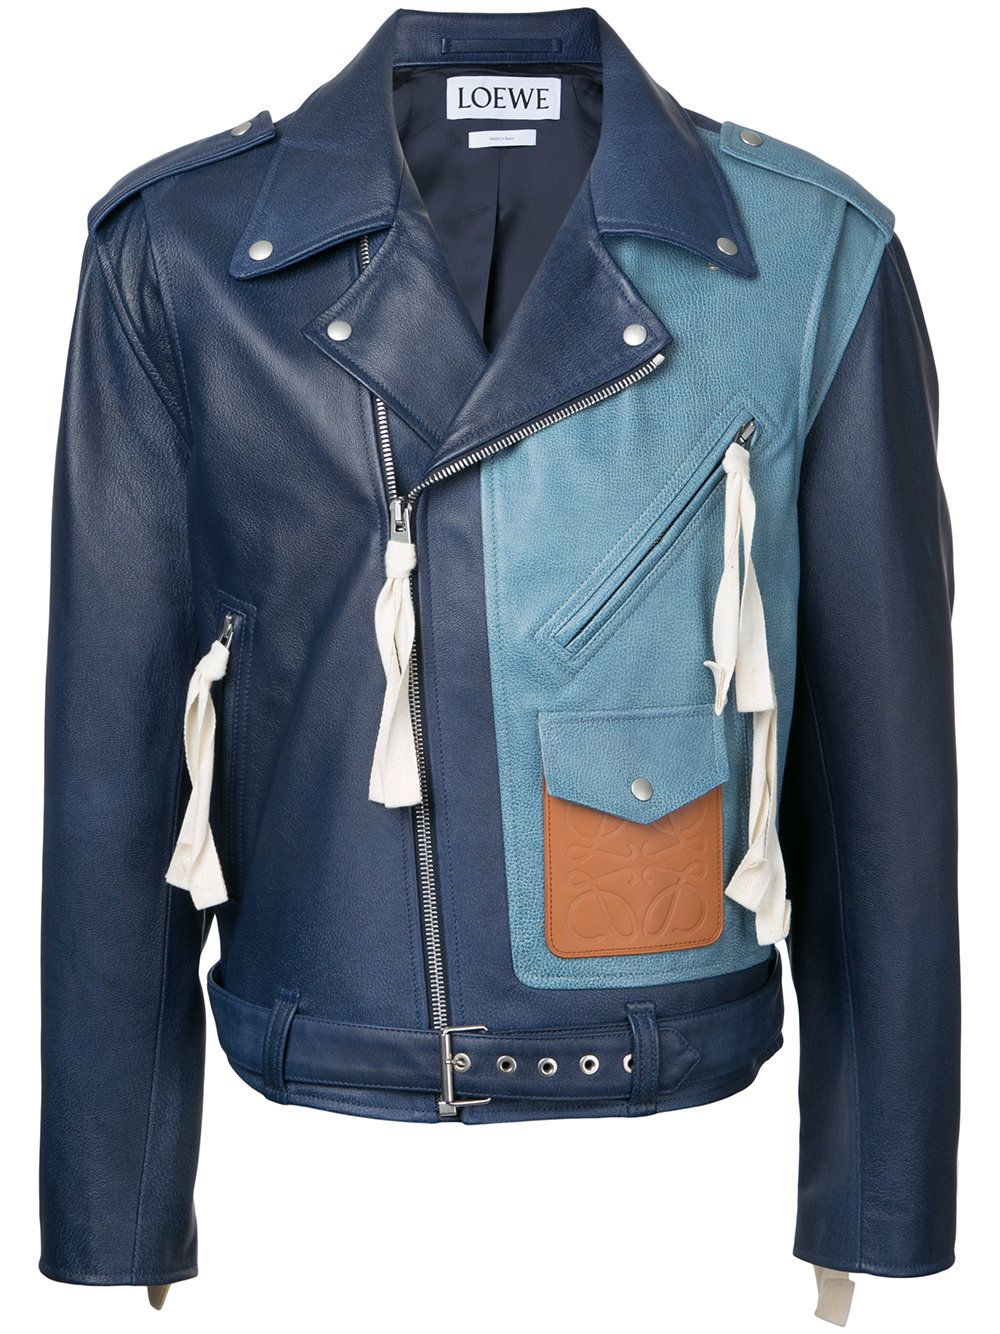 Loewe Colour Block Biker Jacket Leather Jacket Men Mens Jackets Blue Jacket Men